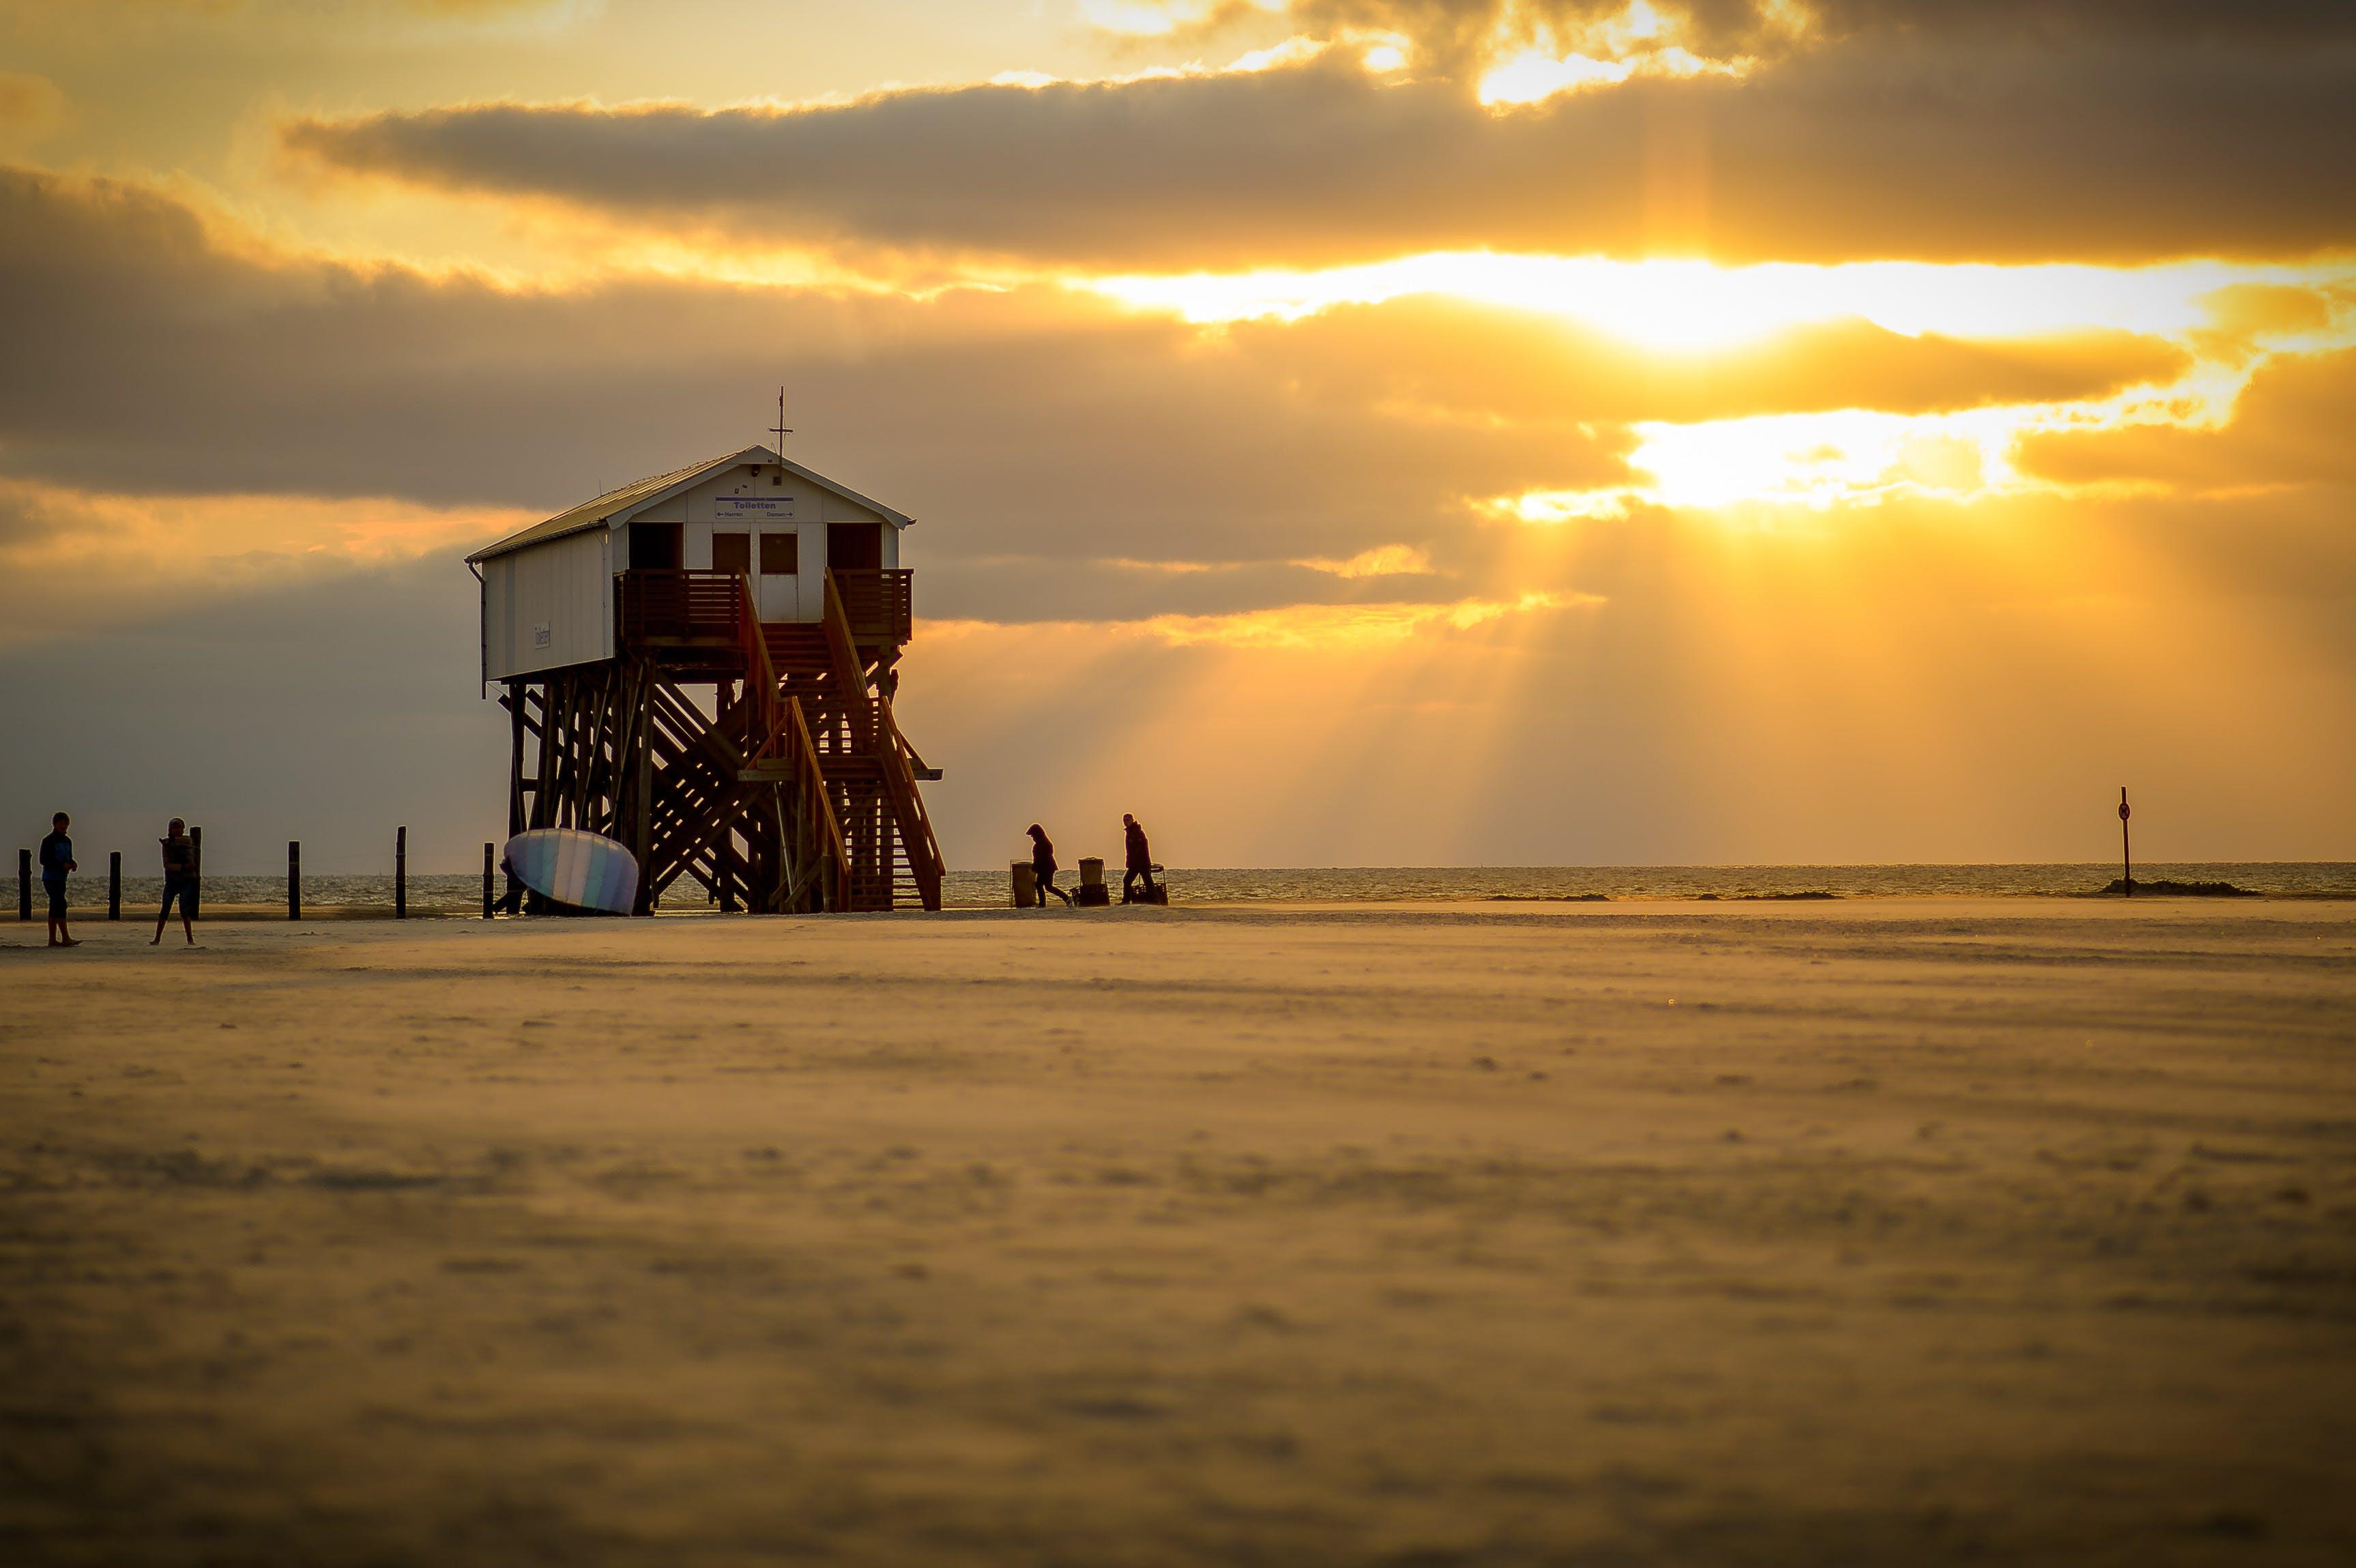 White Lifeguard House on Beach Taken Under White Clouds and Orange Sky